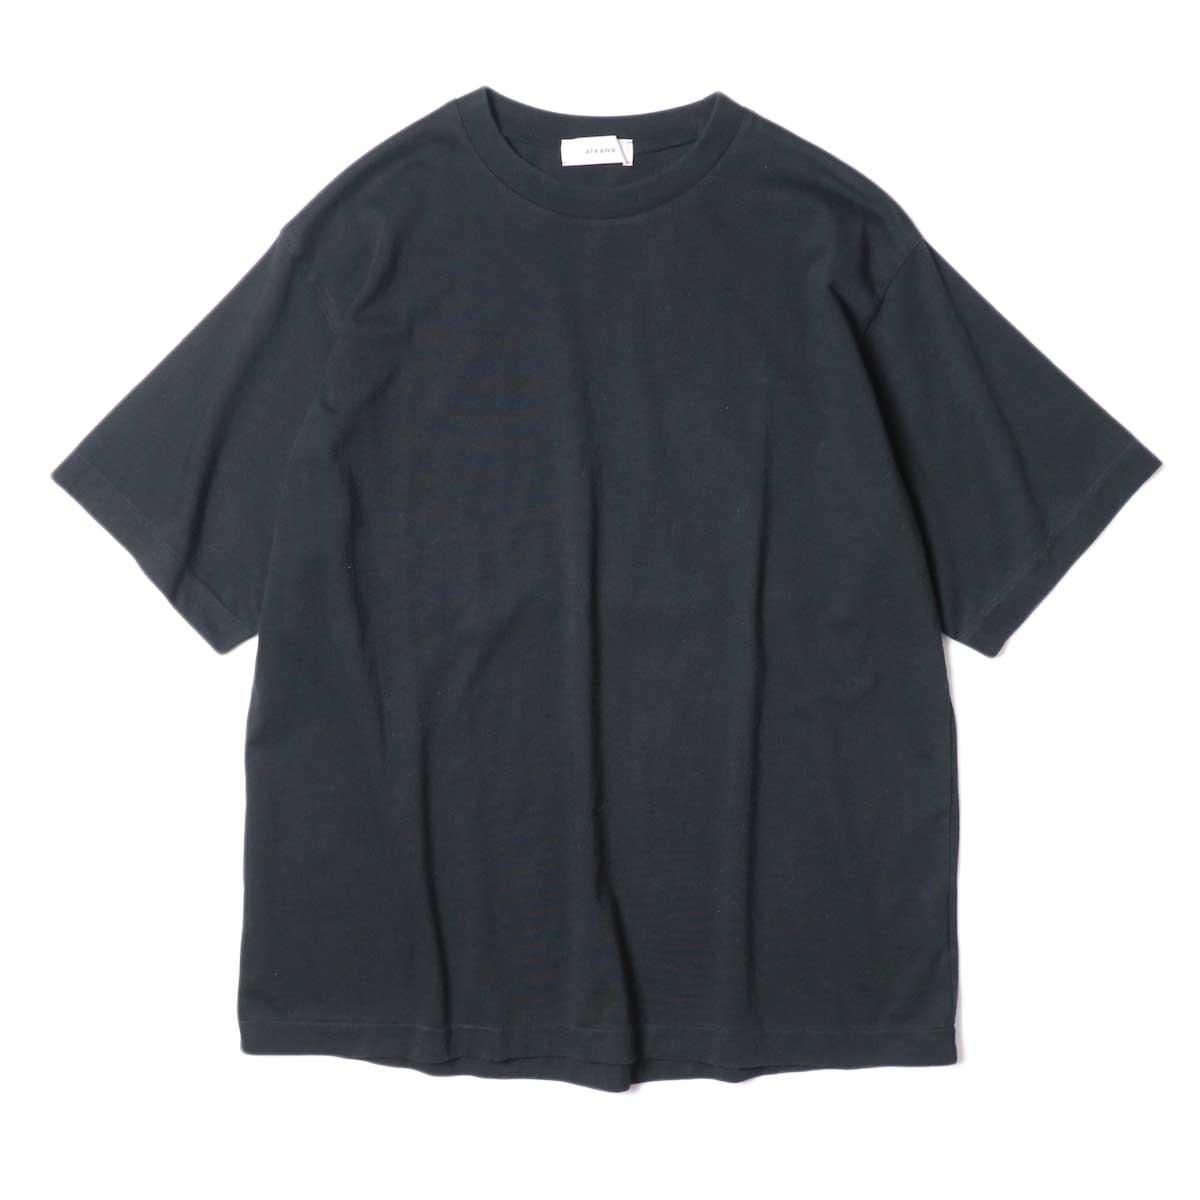 alvana / Dairy Oversize Tee Shirts (Black) 正面